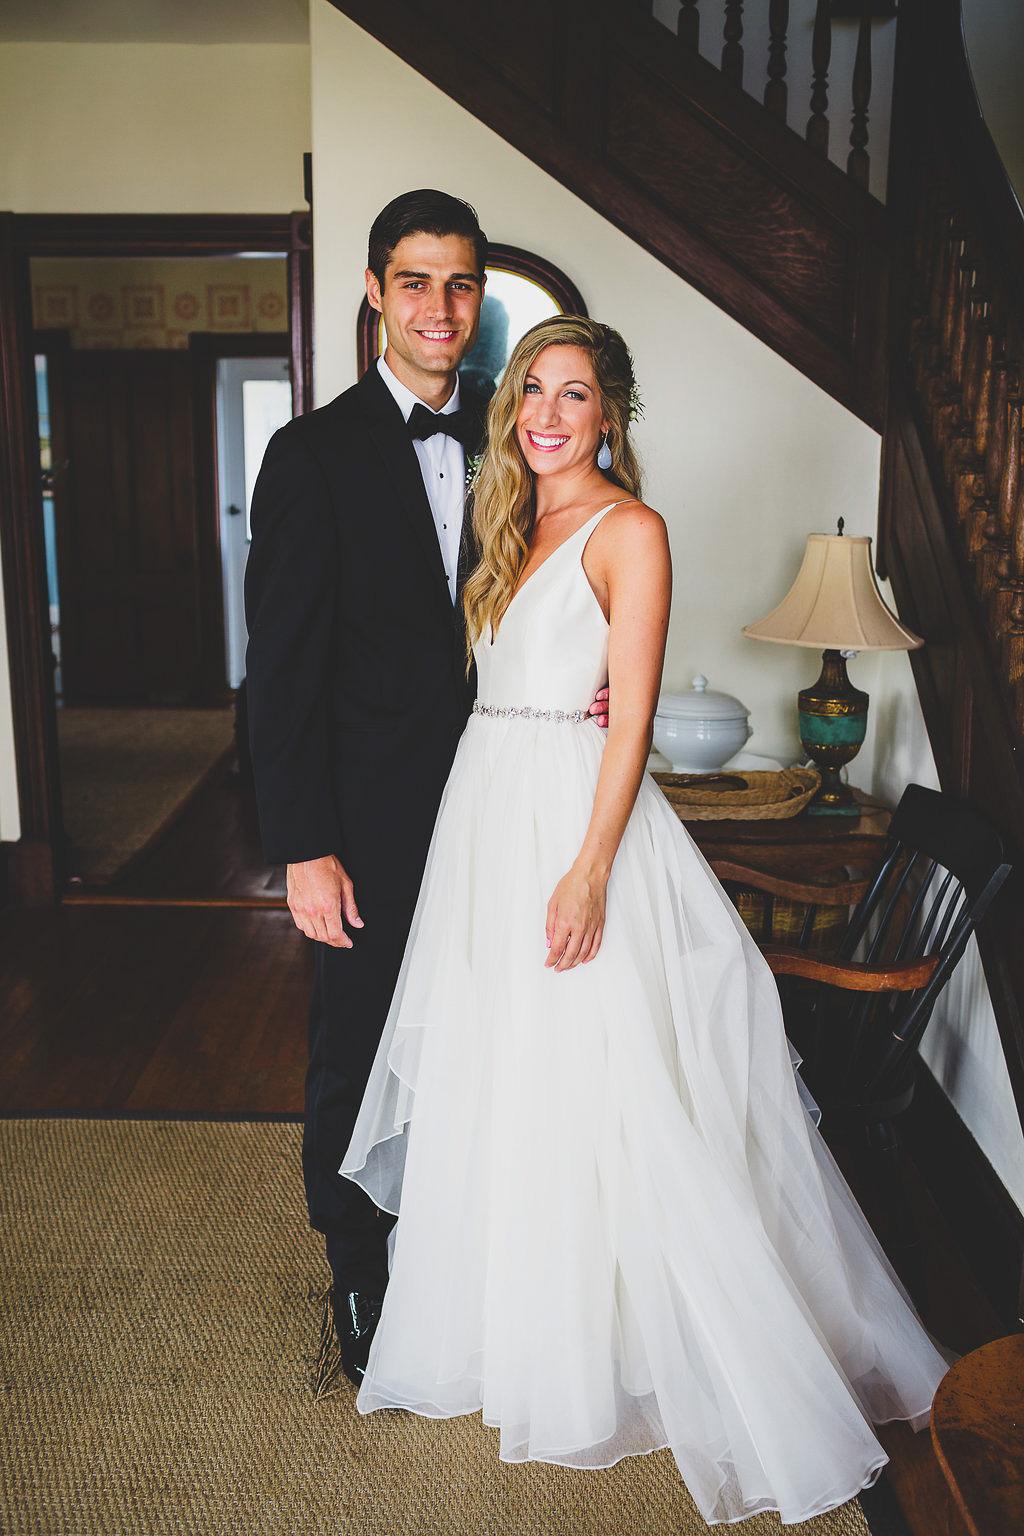 Laid back estate wedding in Martha's Vineyard at The Chilmark Tower House | blog.cassiecastellaw.com